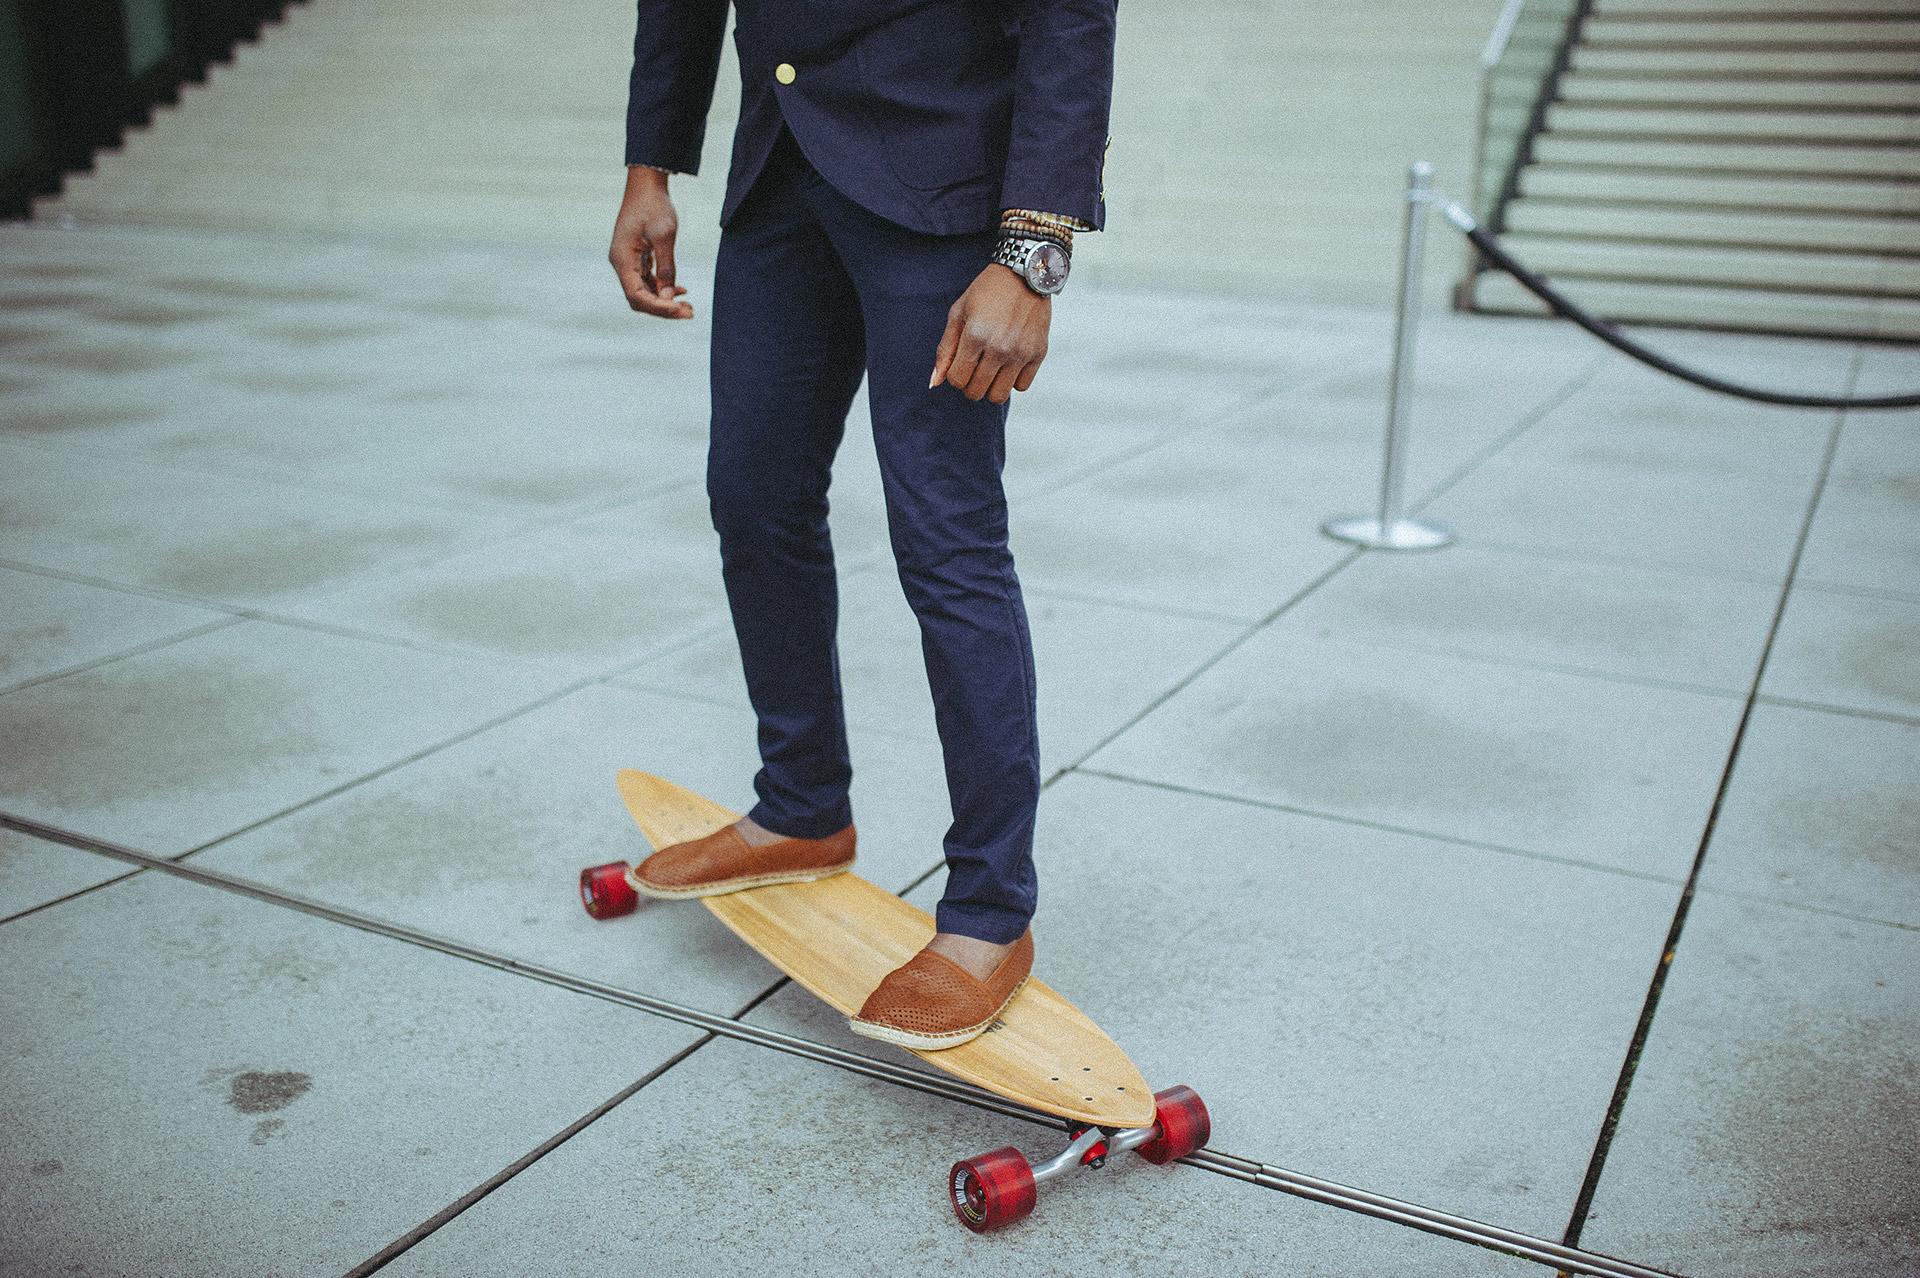 Anzug vs. Longboard